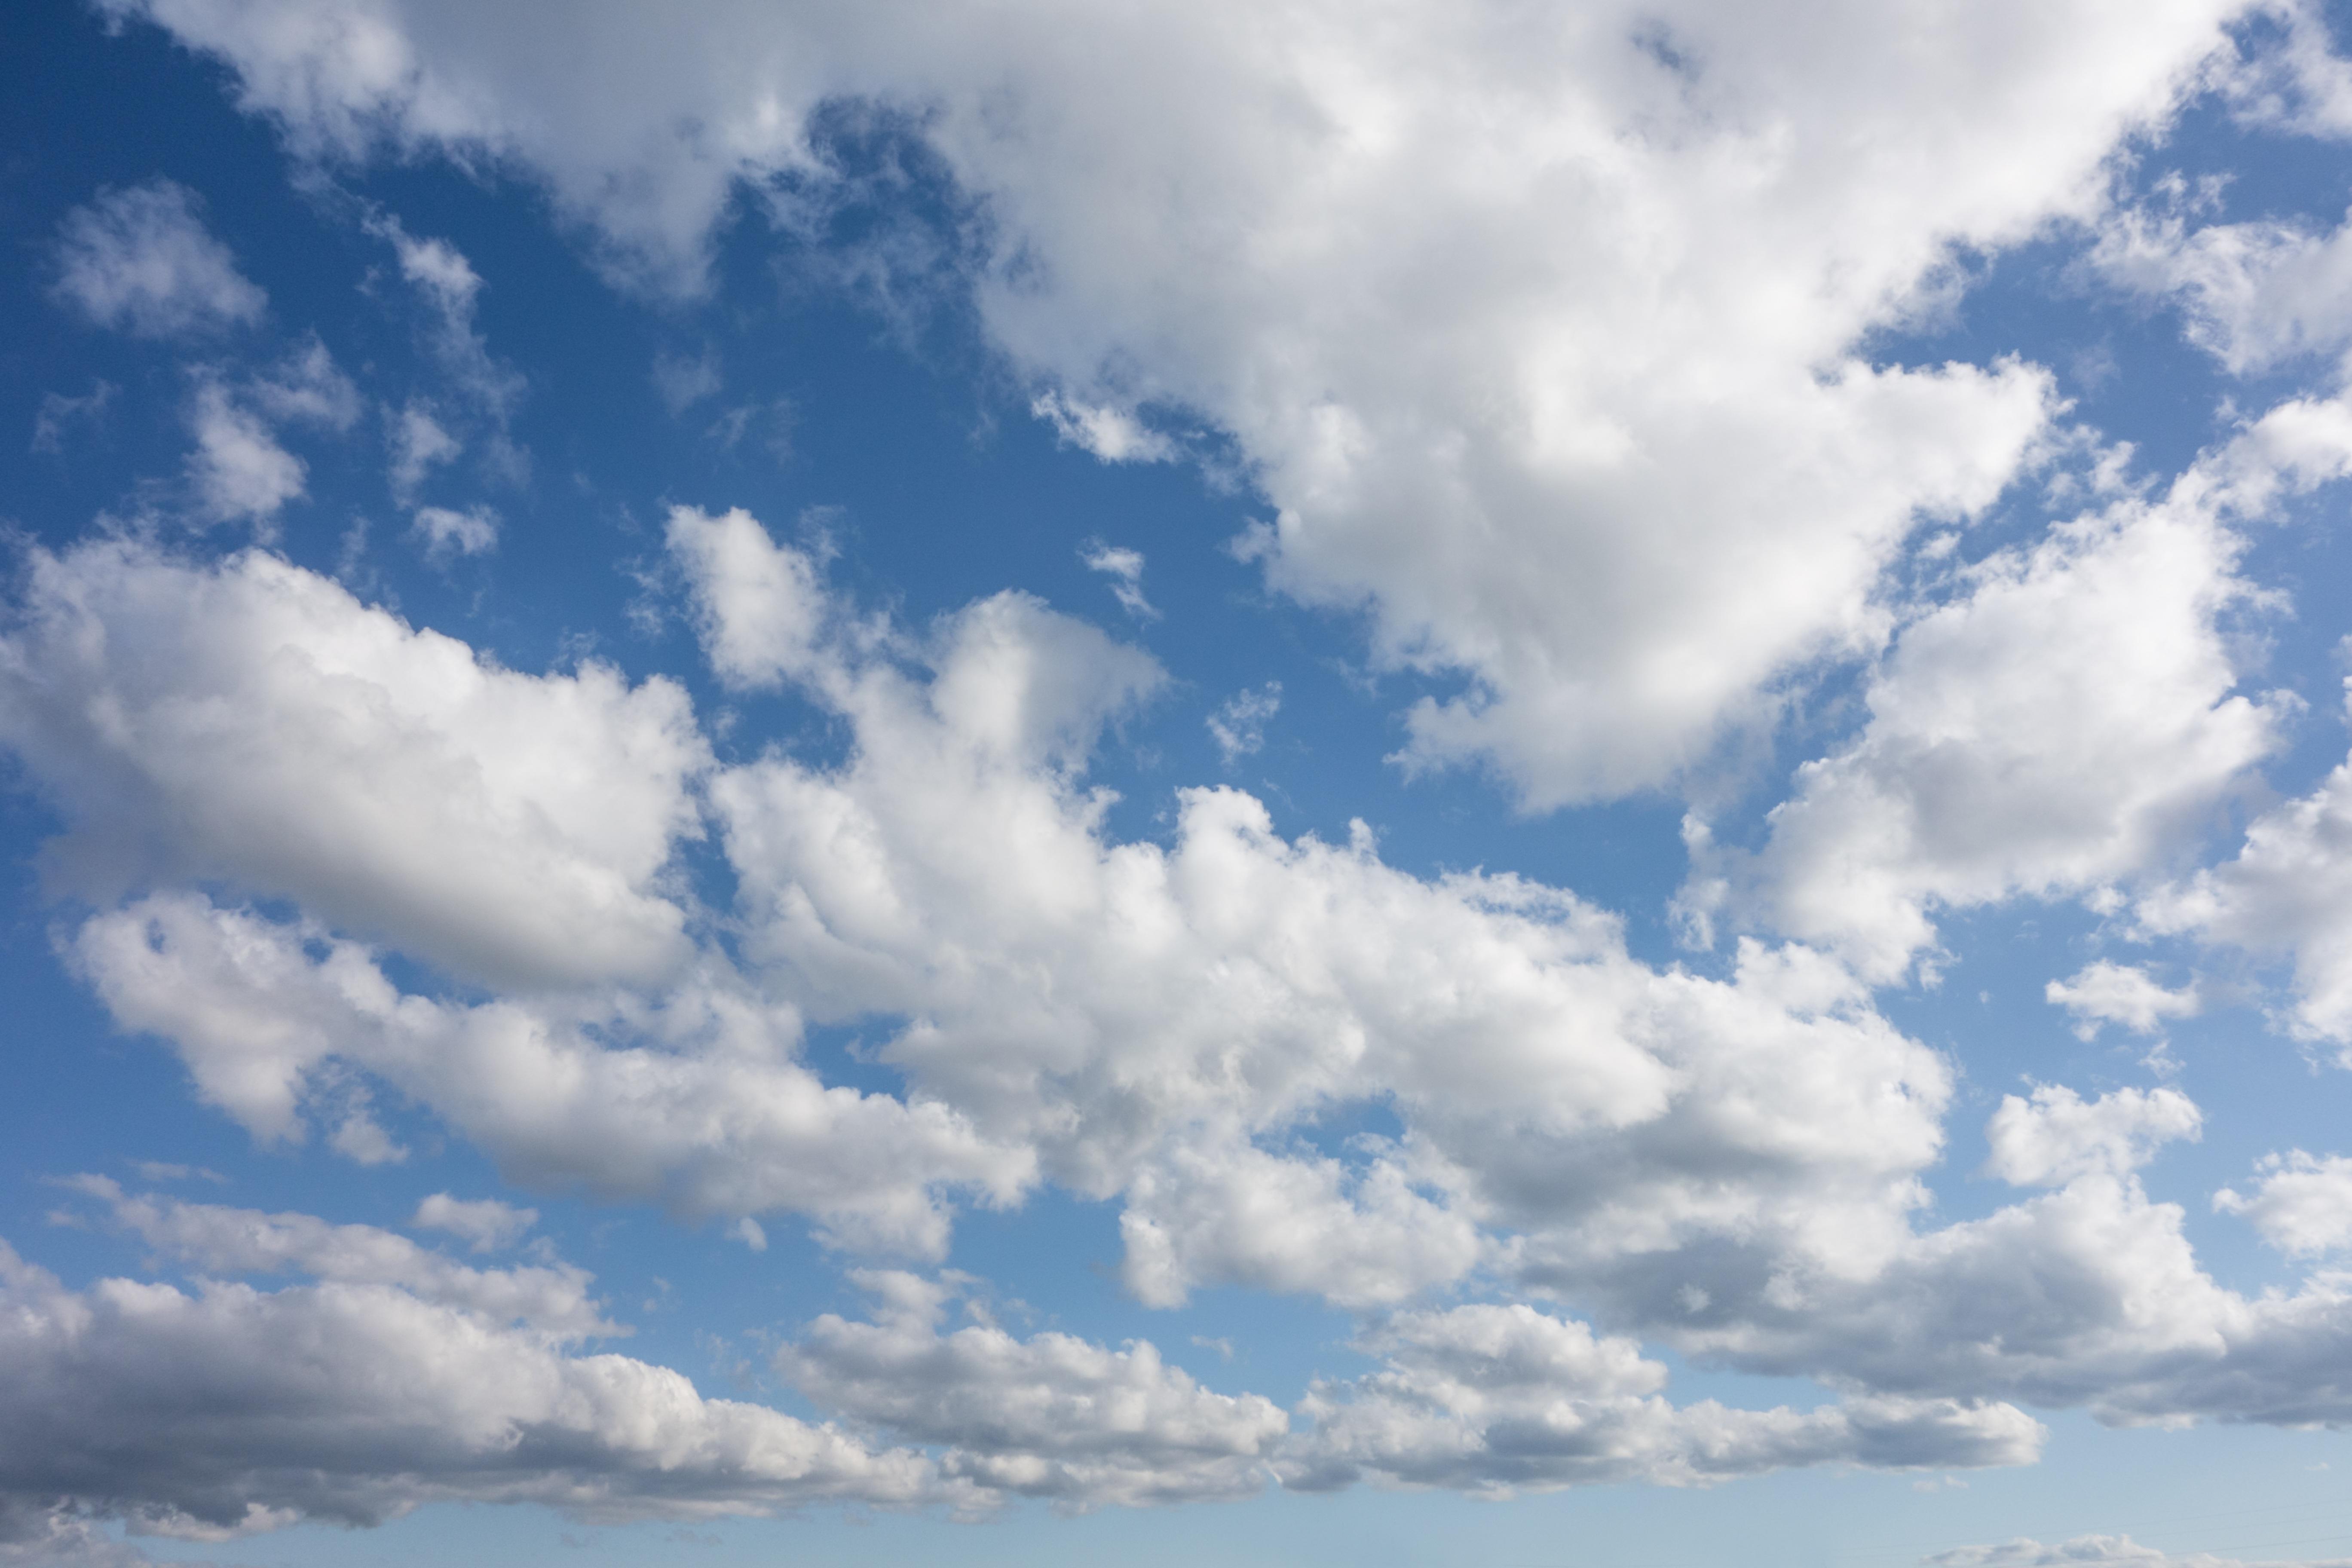 landscape sky blue clouds sun light rays HD wallpaper  |Light Blue Sky Clouds